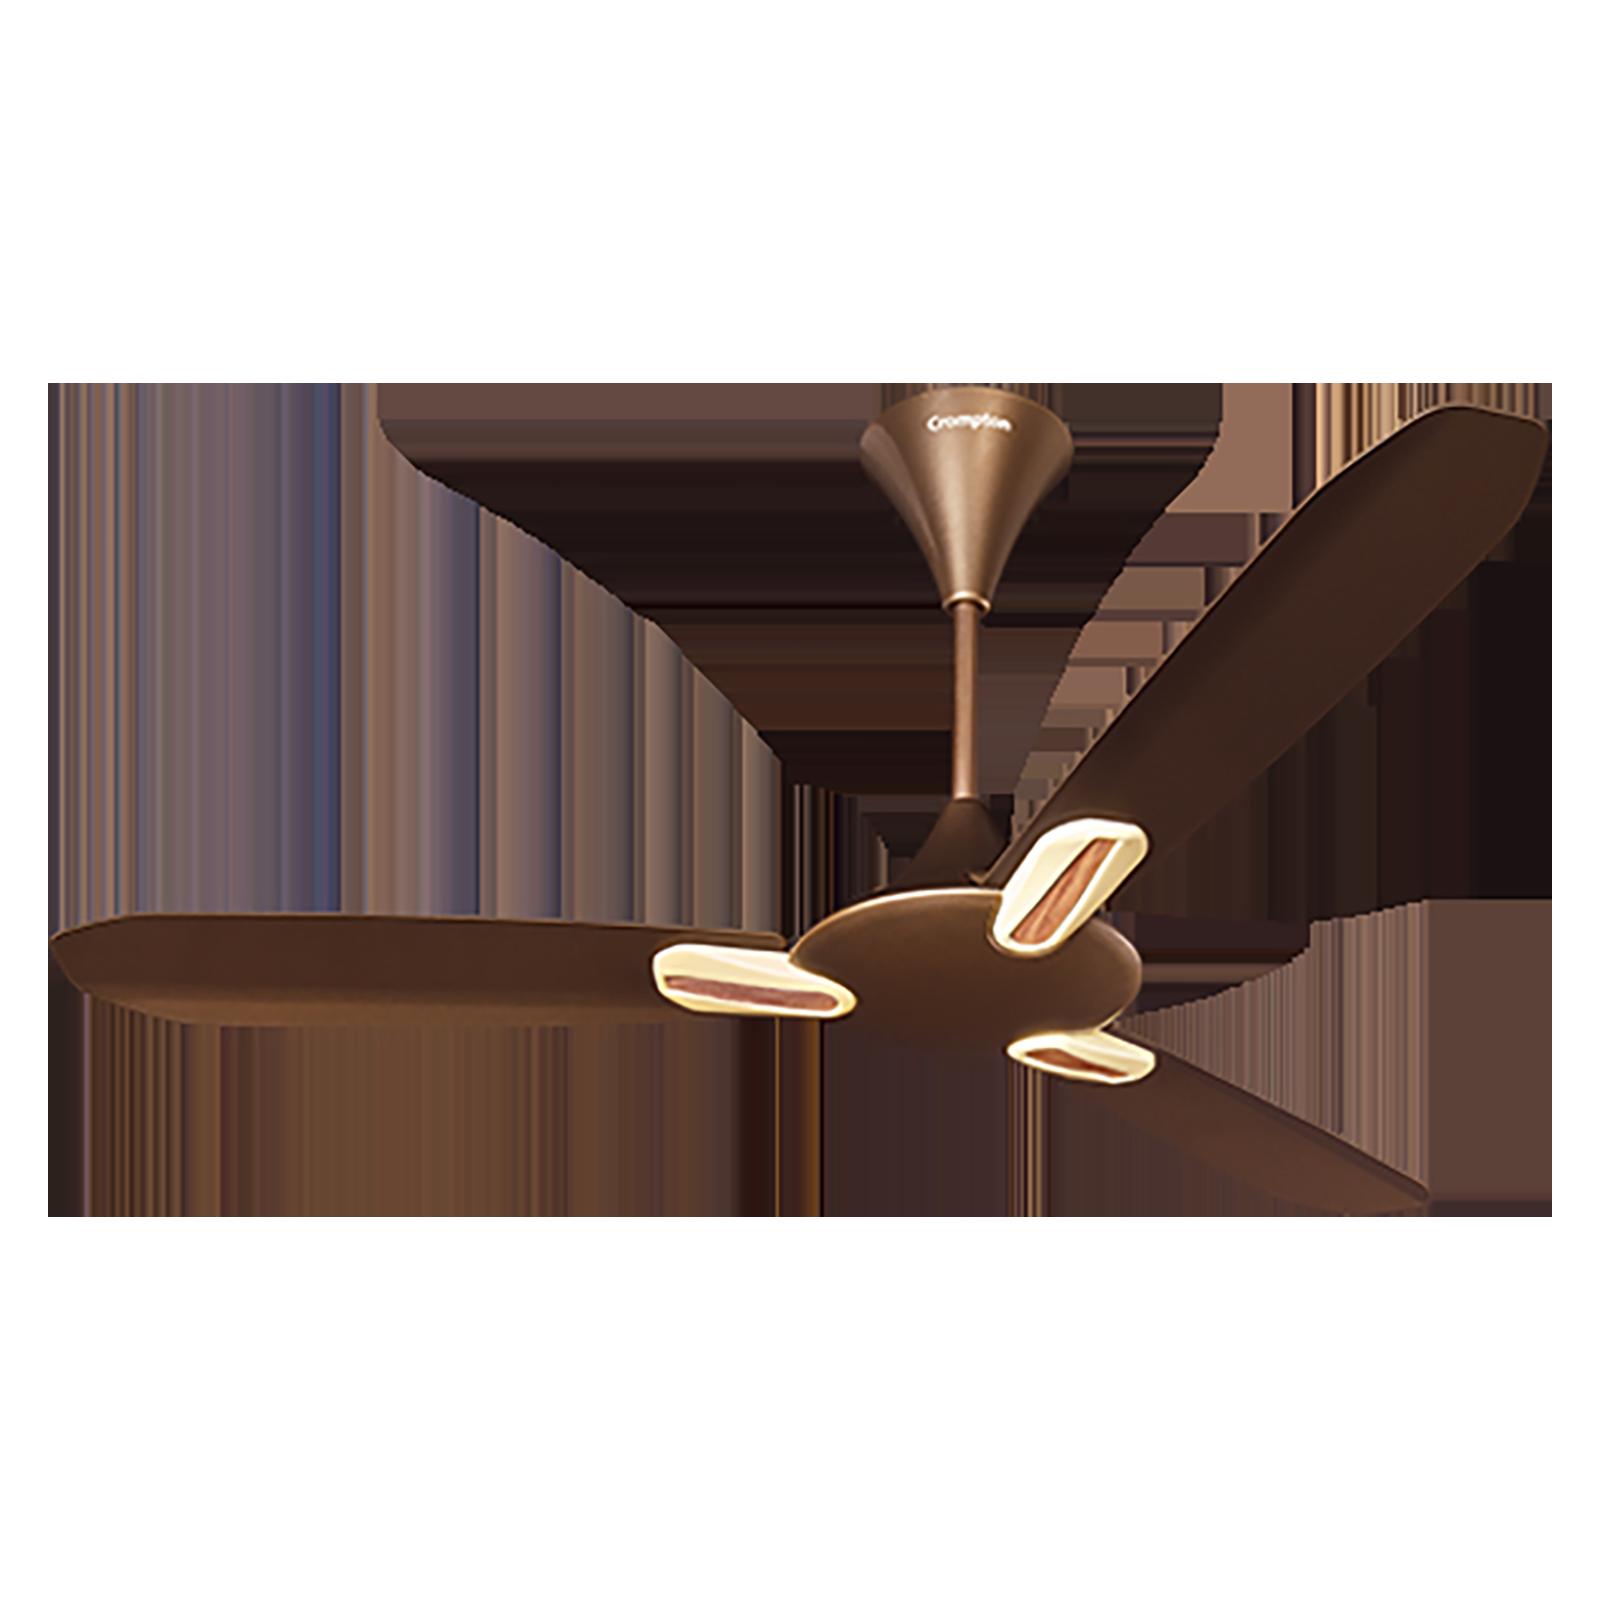 Crompton Dignita 120cm 3 Blade Ceiling Fan (Anti-Dust Technology, DIGNITAAD48CRML, Caramel)_1